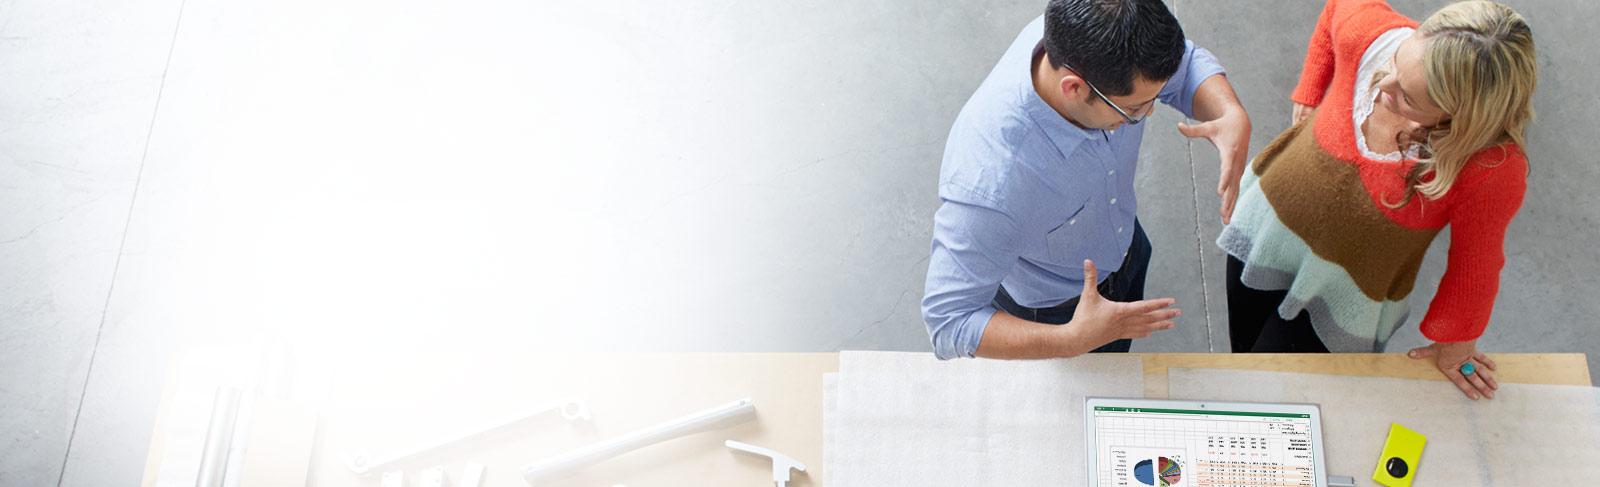 Personnaliser l'installation d'office 2016 avec OCT